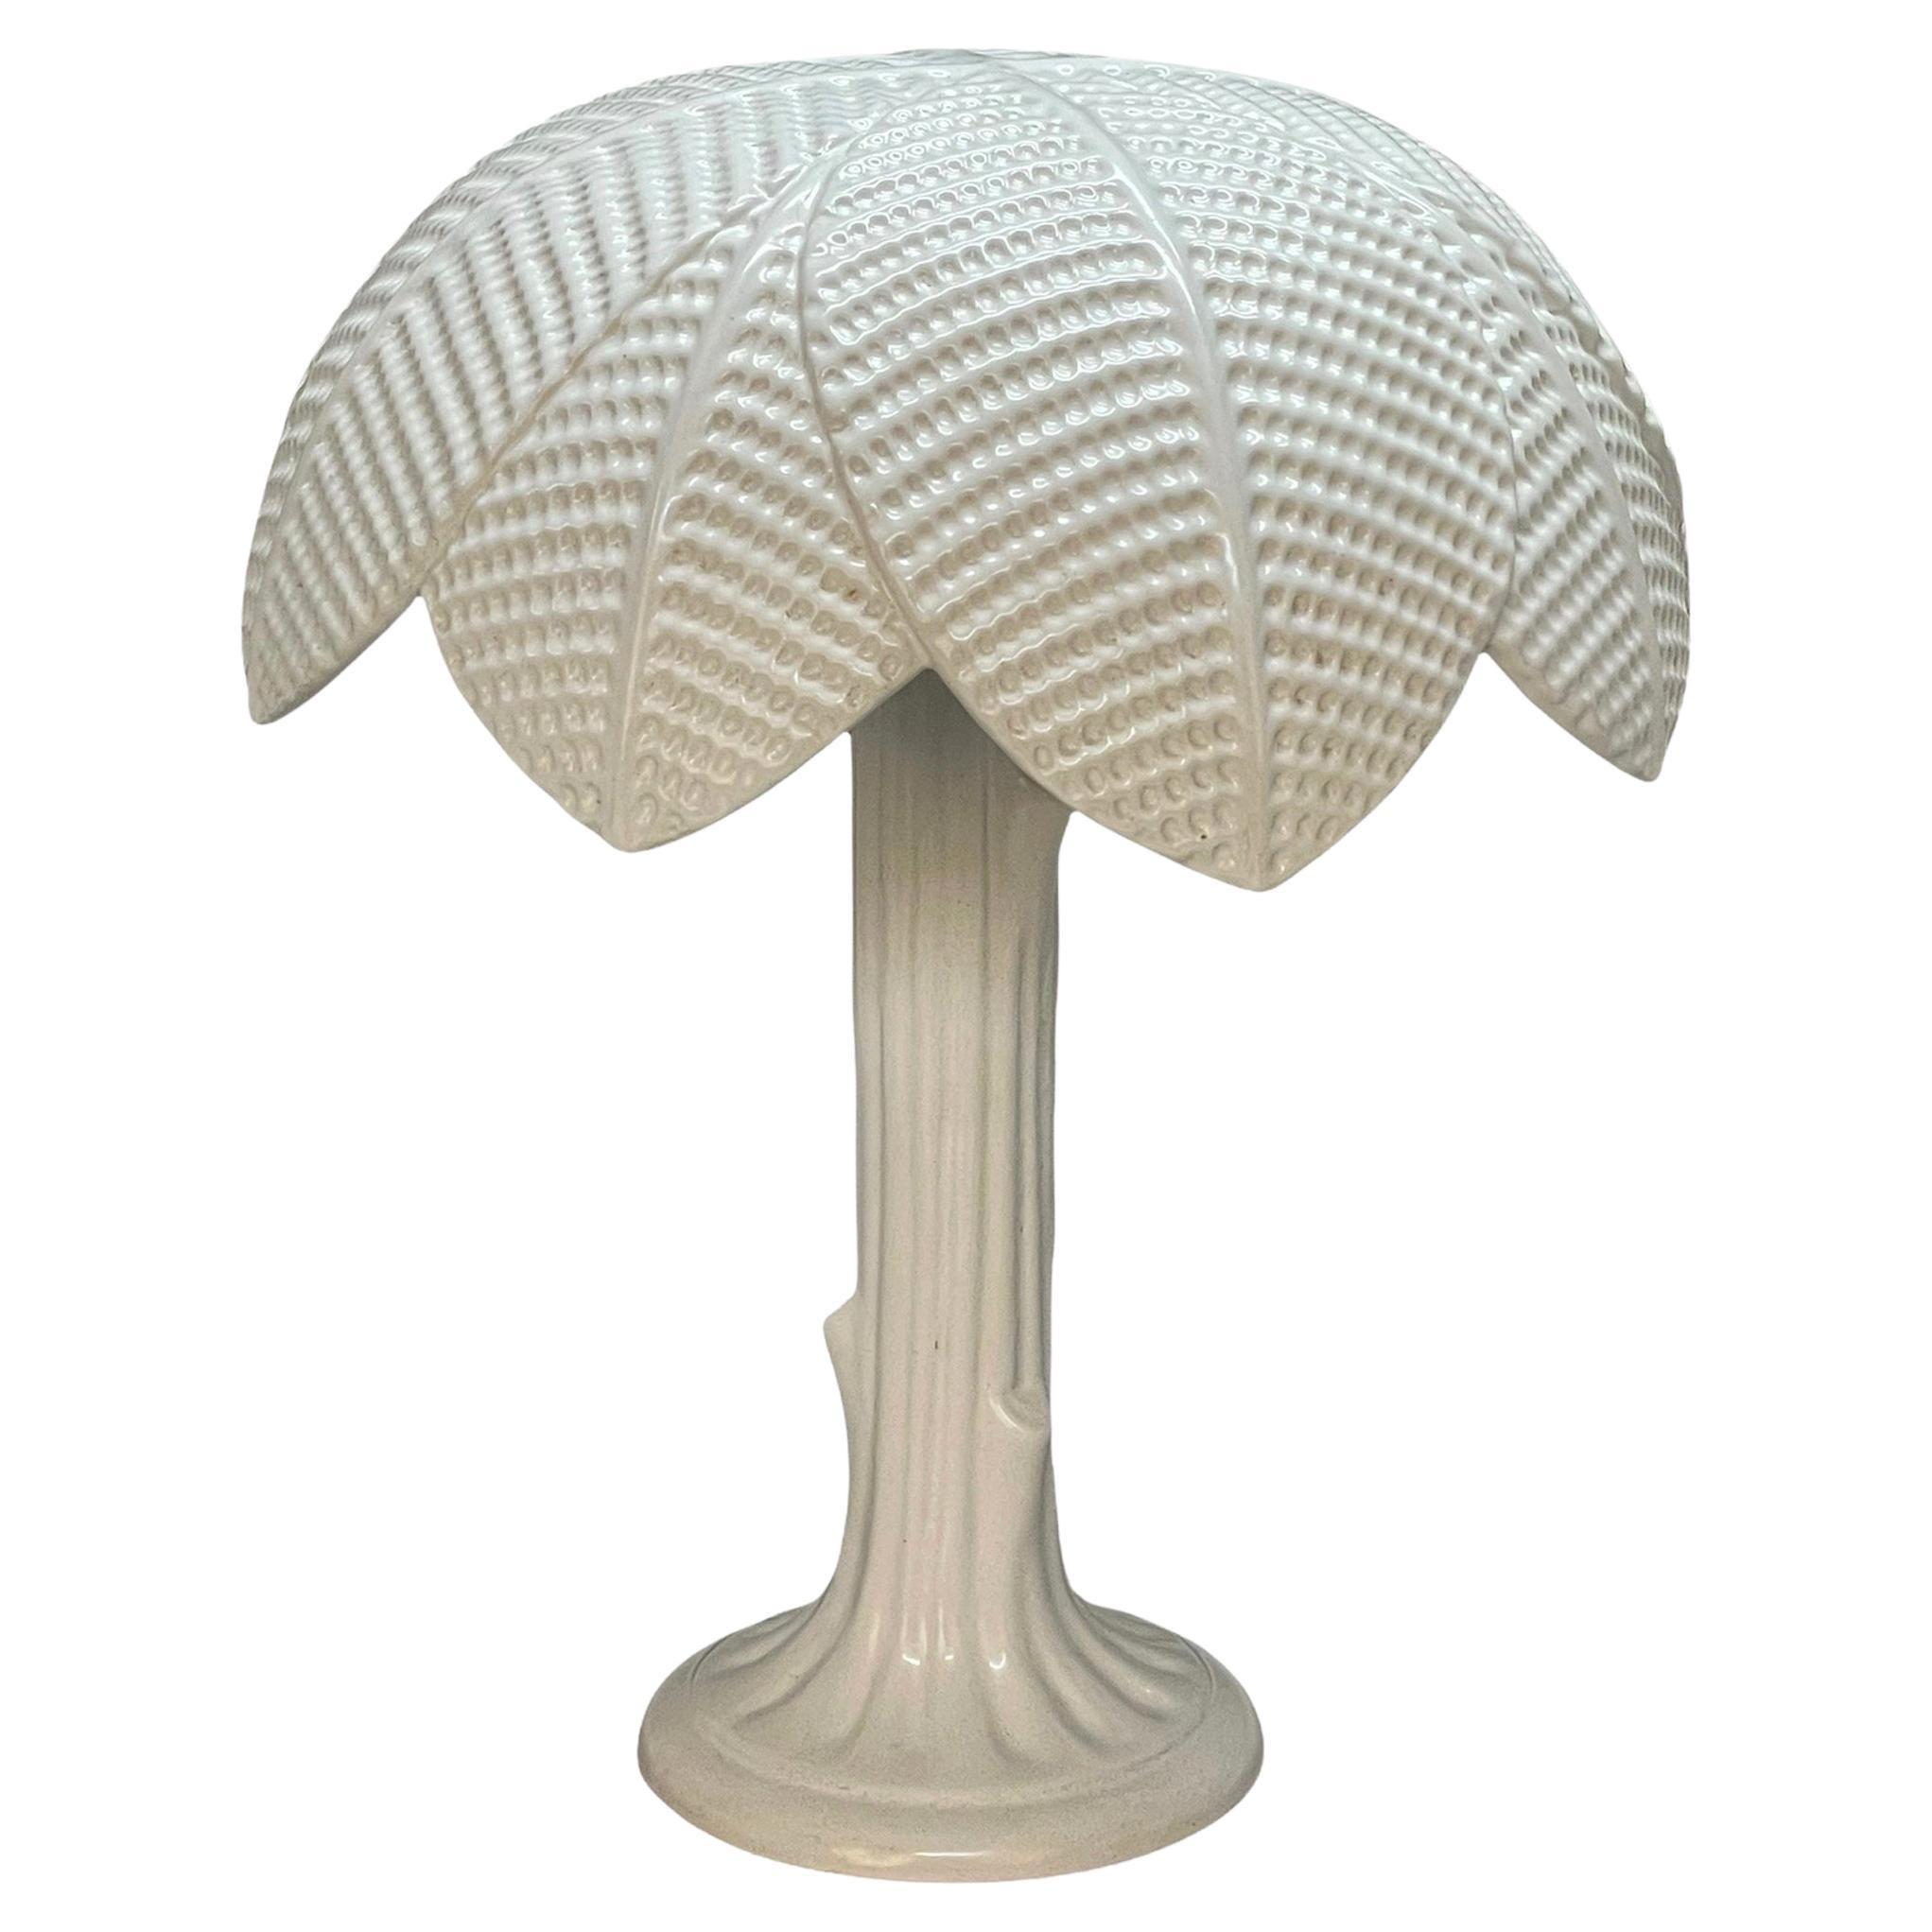 "Tommaso Barbi Midcentury White Glazed Ceramic ""Palma"" Italian Table Lamp, 1970"